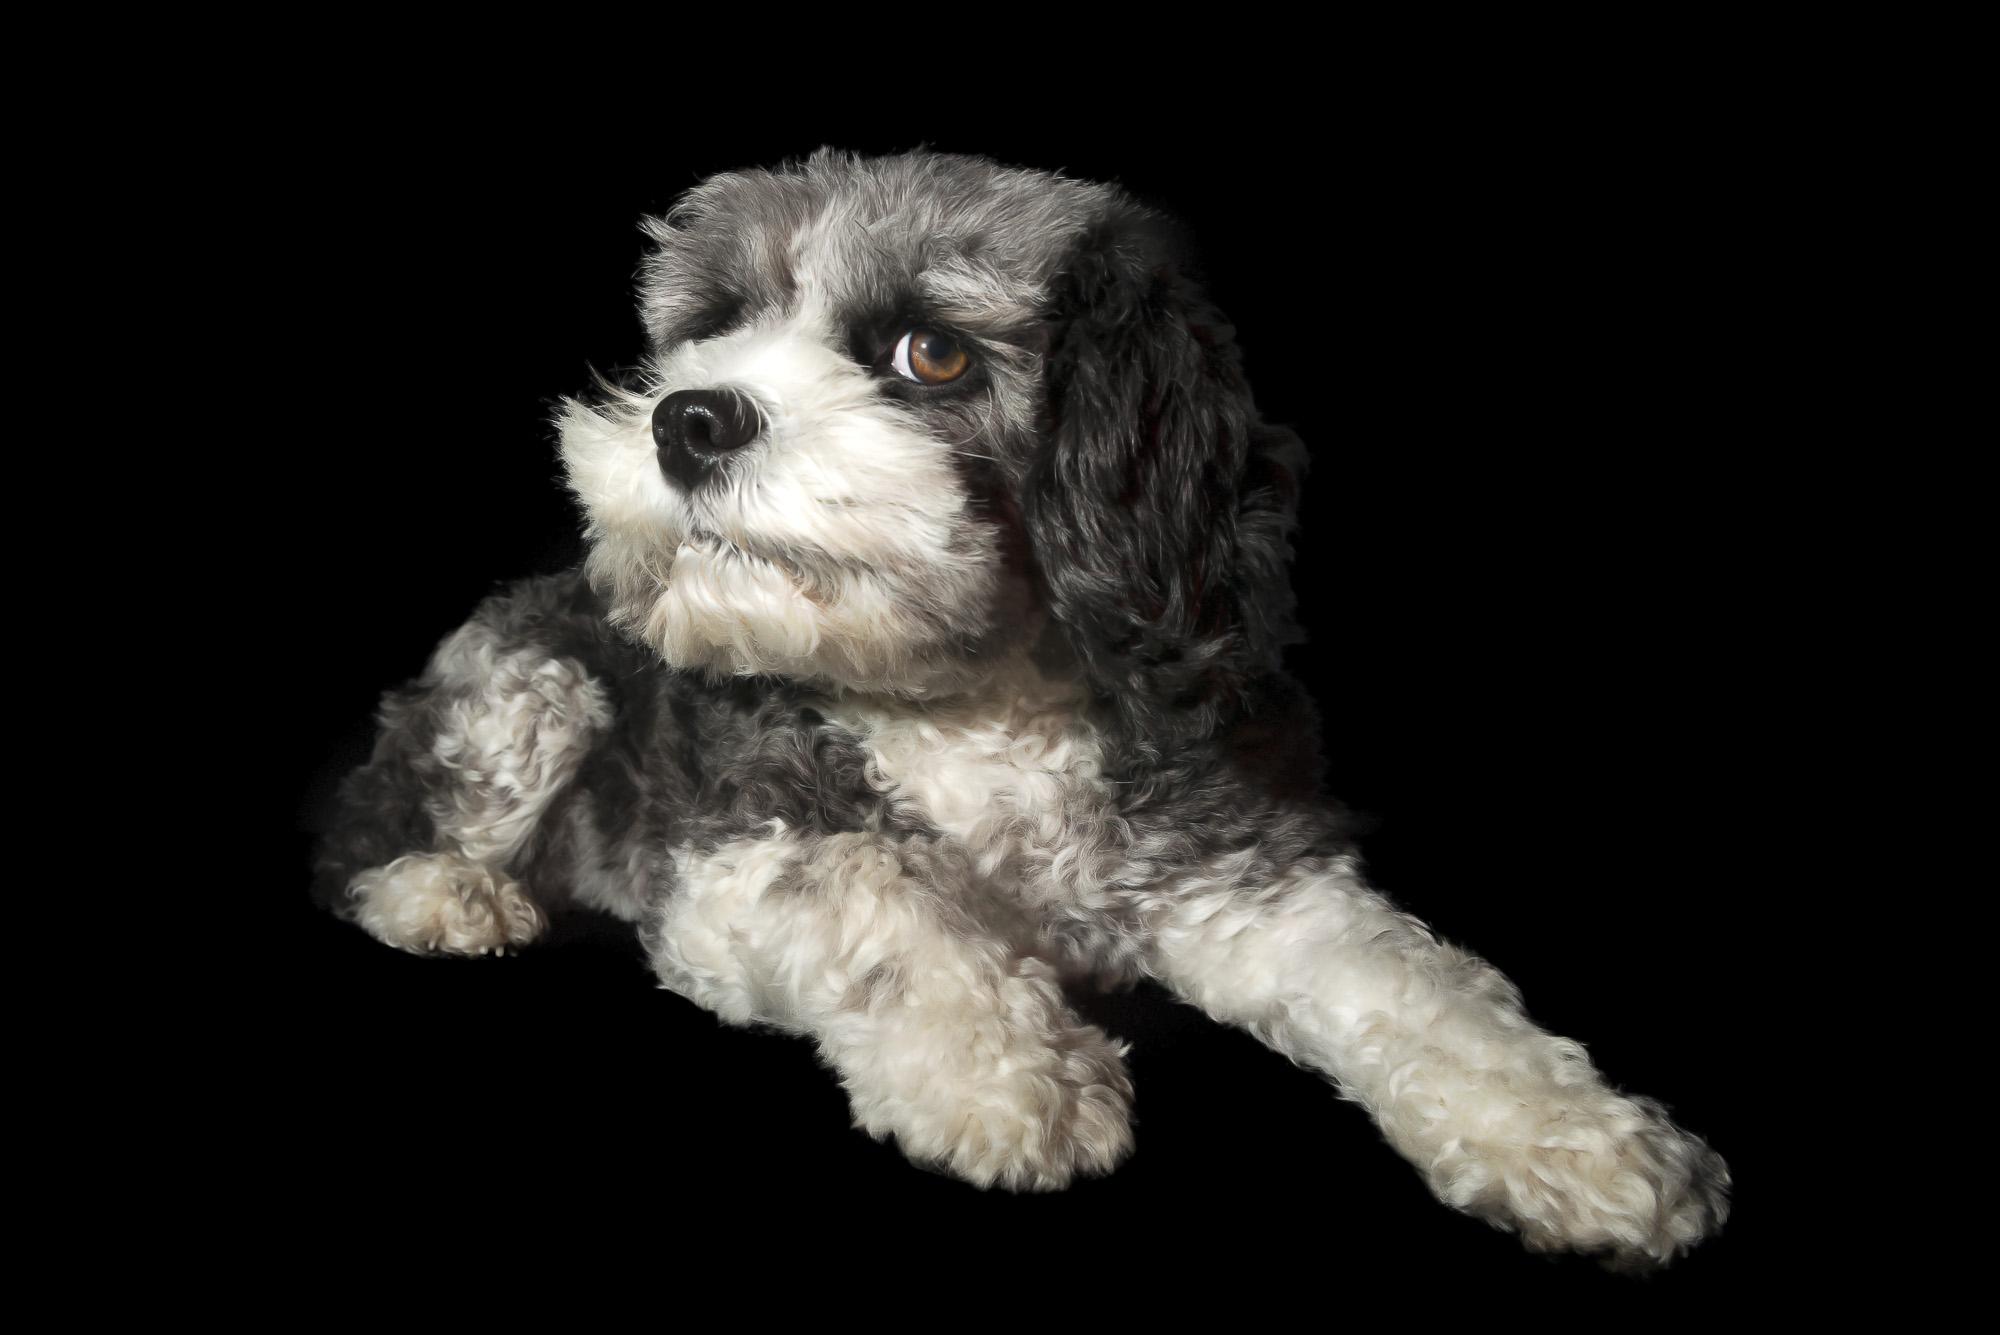 LupinBay-0118-Dog-Pet-Photography-1414.jpg